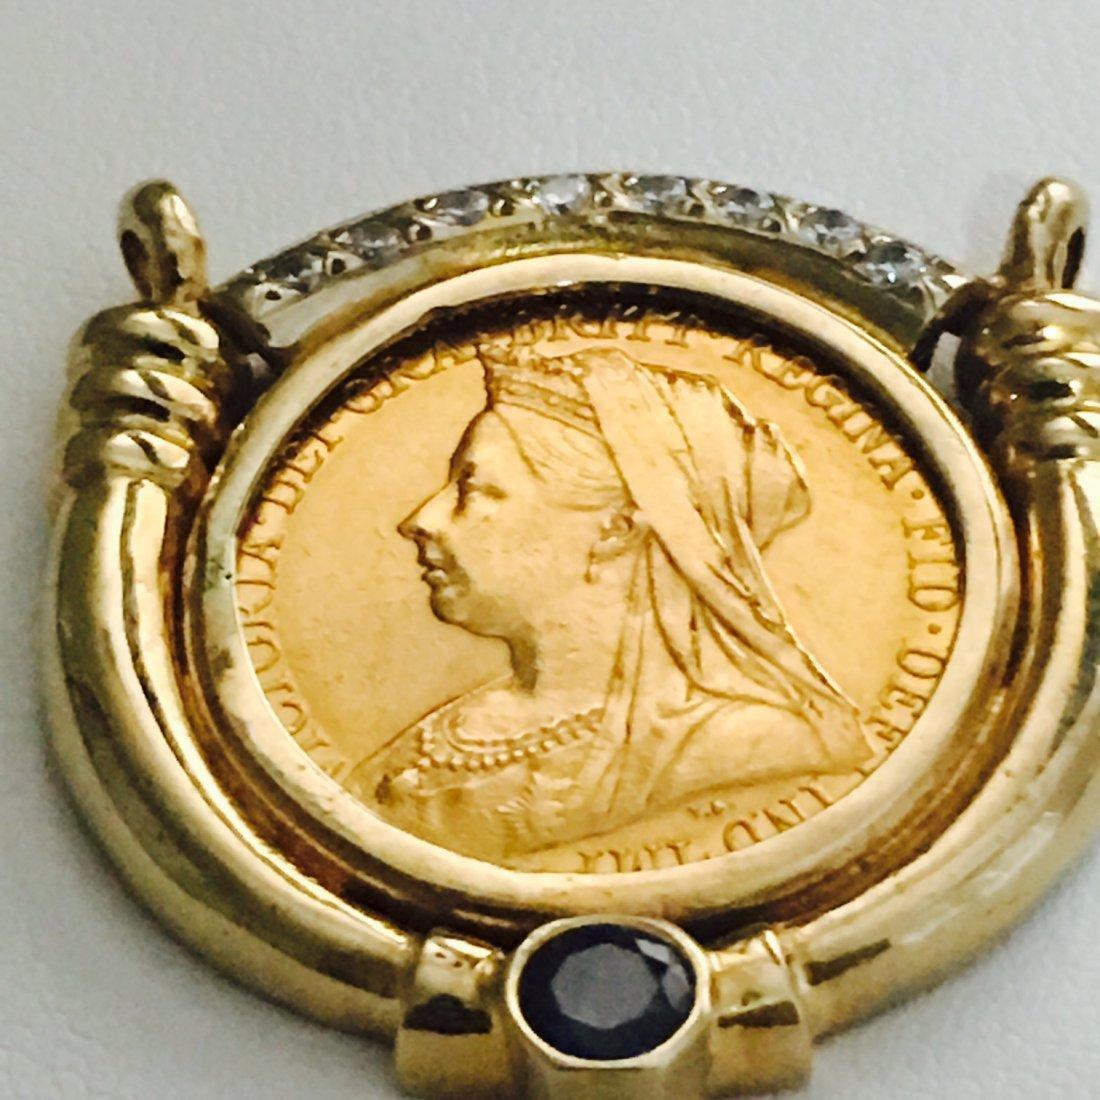 1899 QUEEN VICTORIA GOLD COIN W/ DIAMOND  BLUE SAPPHIRE - 2